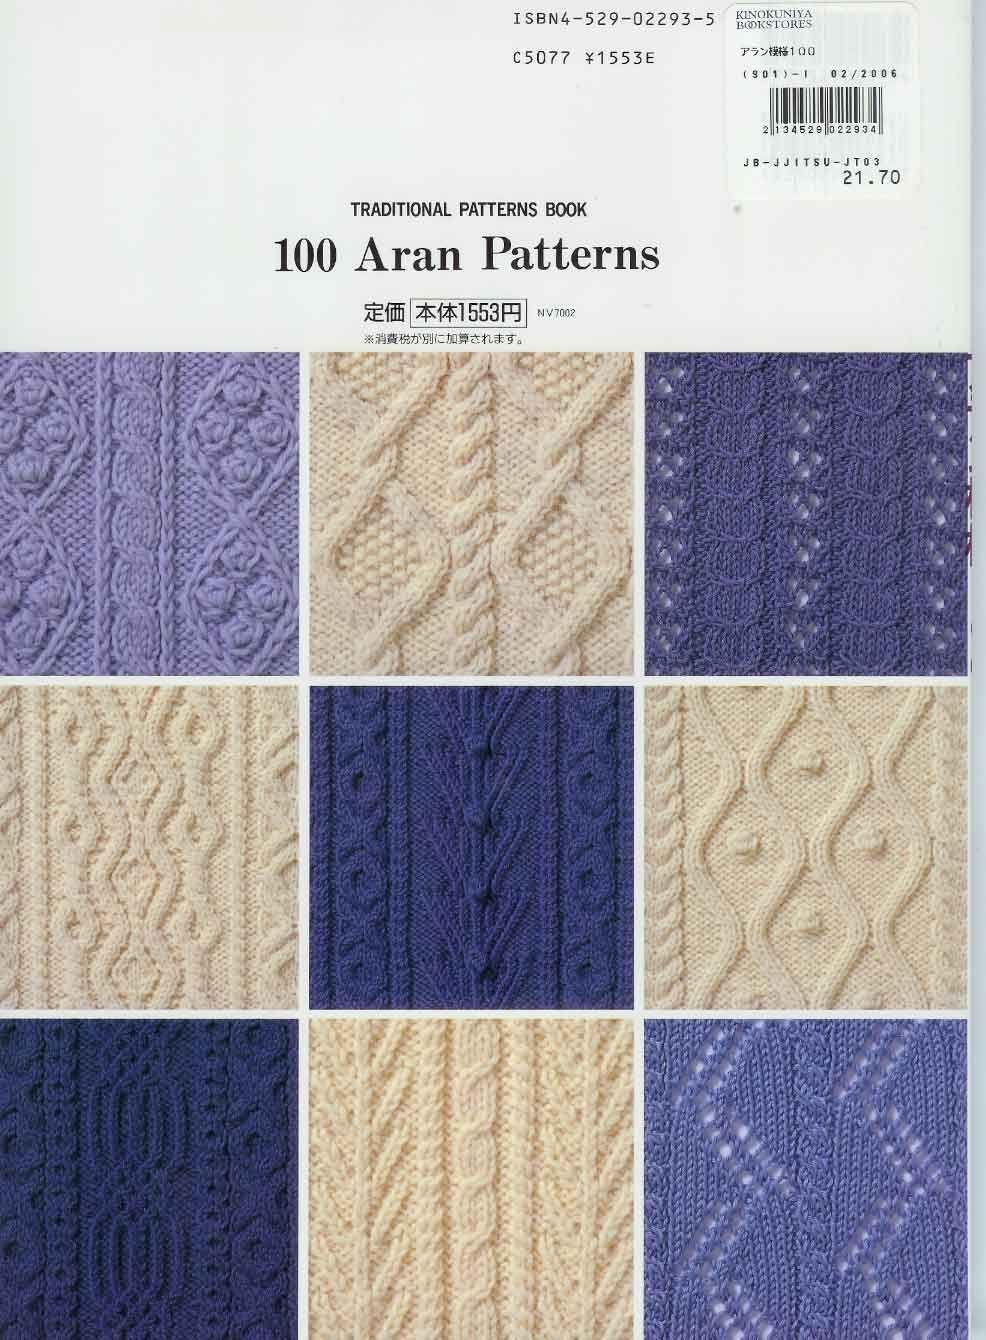 Moda Knitting Books : Midwinter reds minnick simpson moda fabric quilt charm